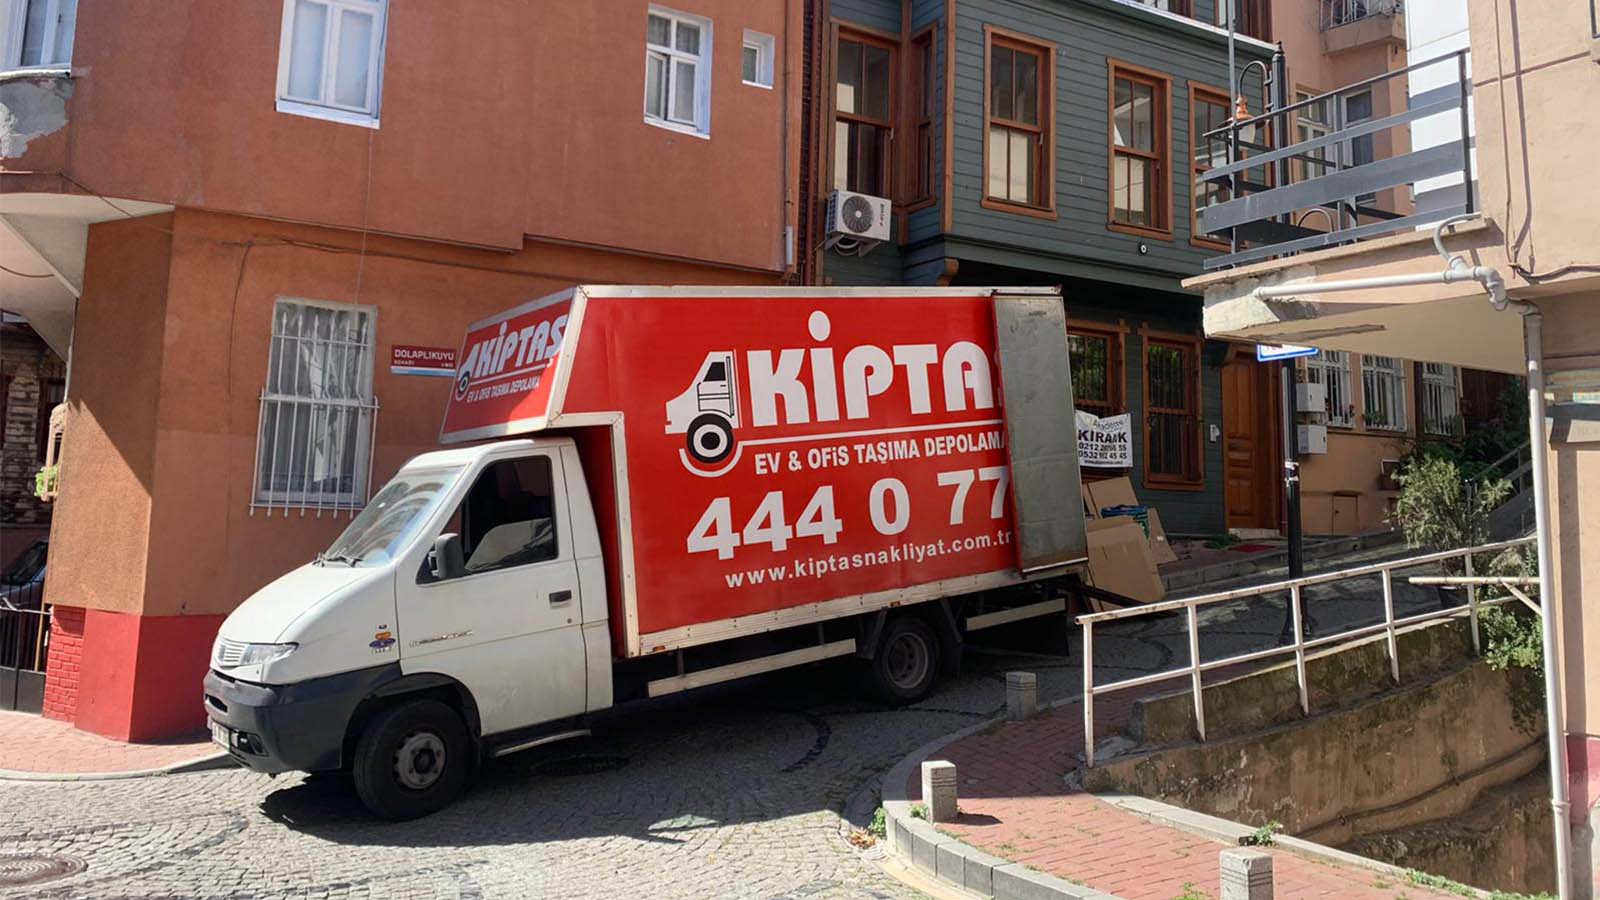 Beşiktaş Ofis Taşıma Şirketi